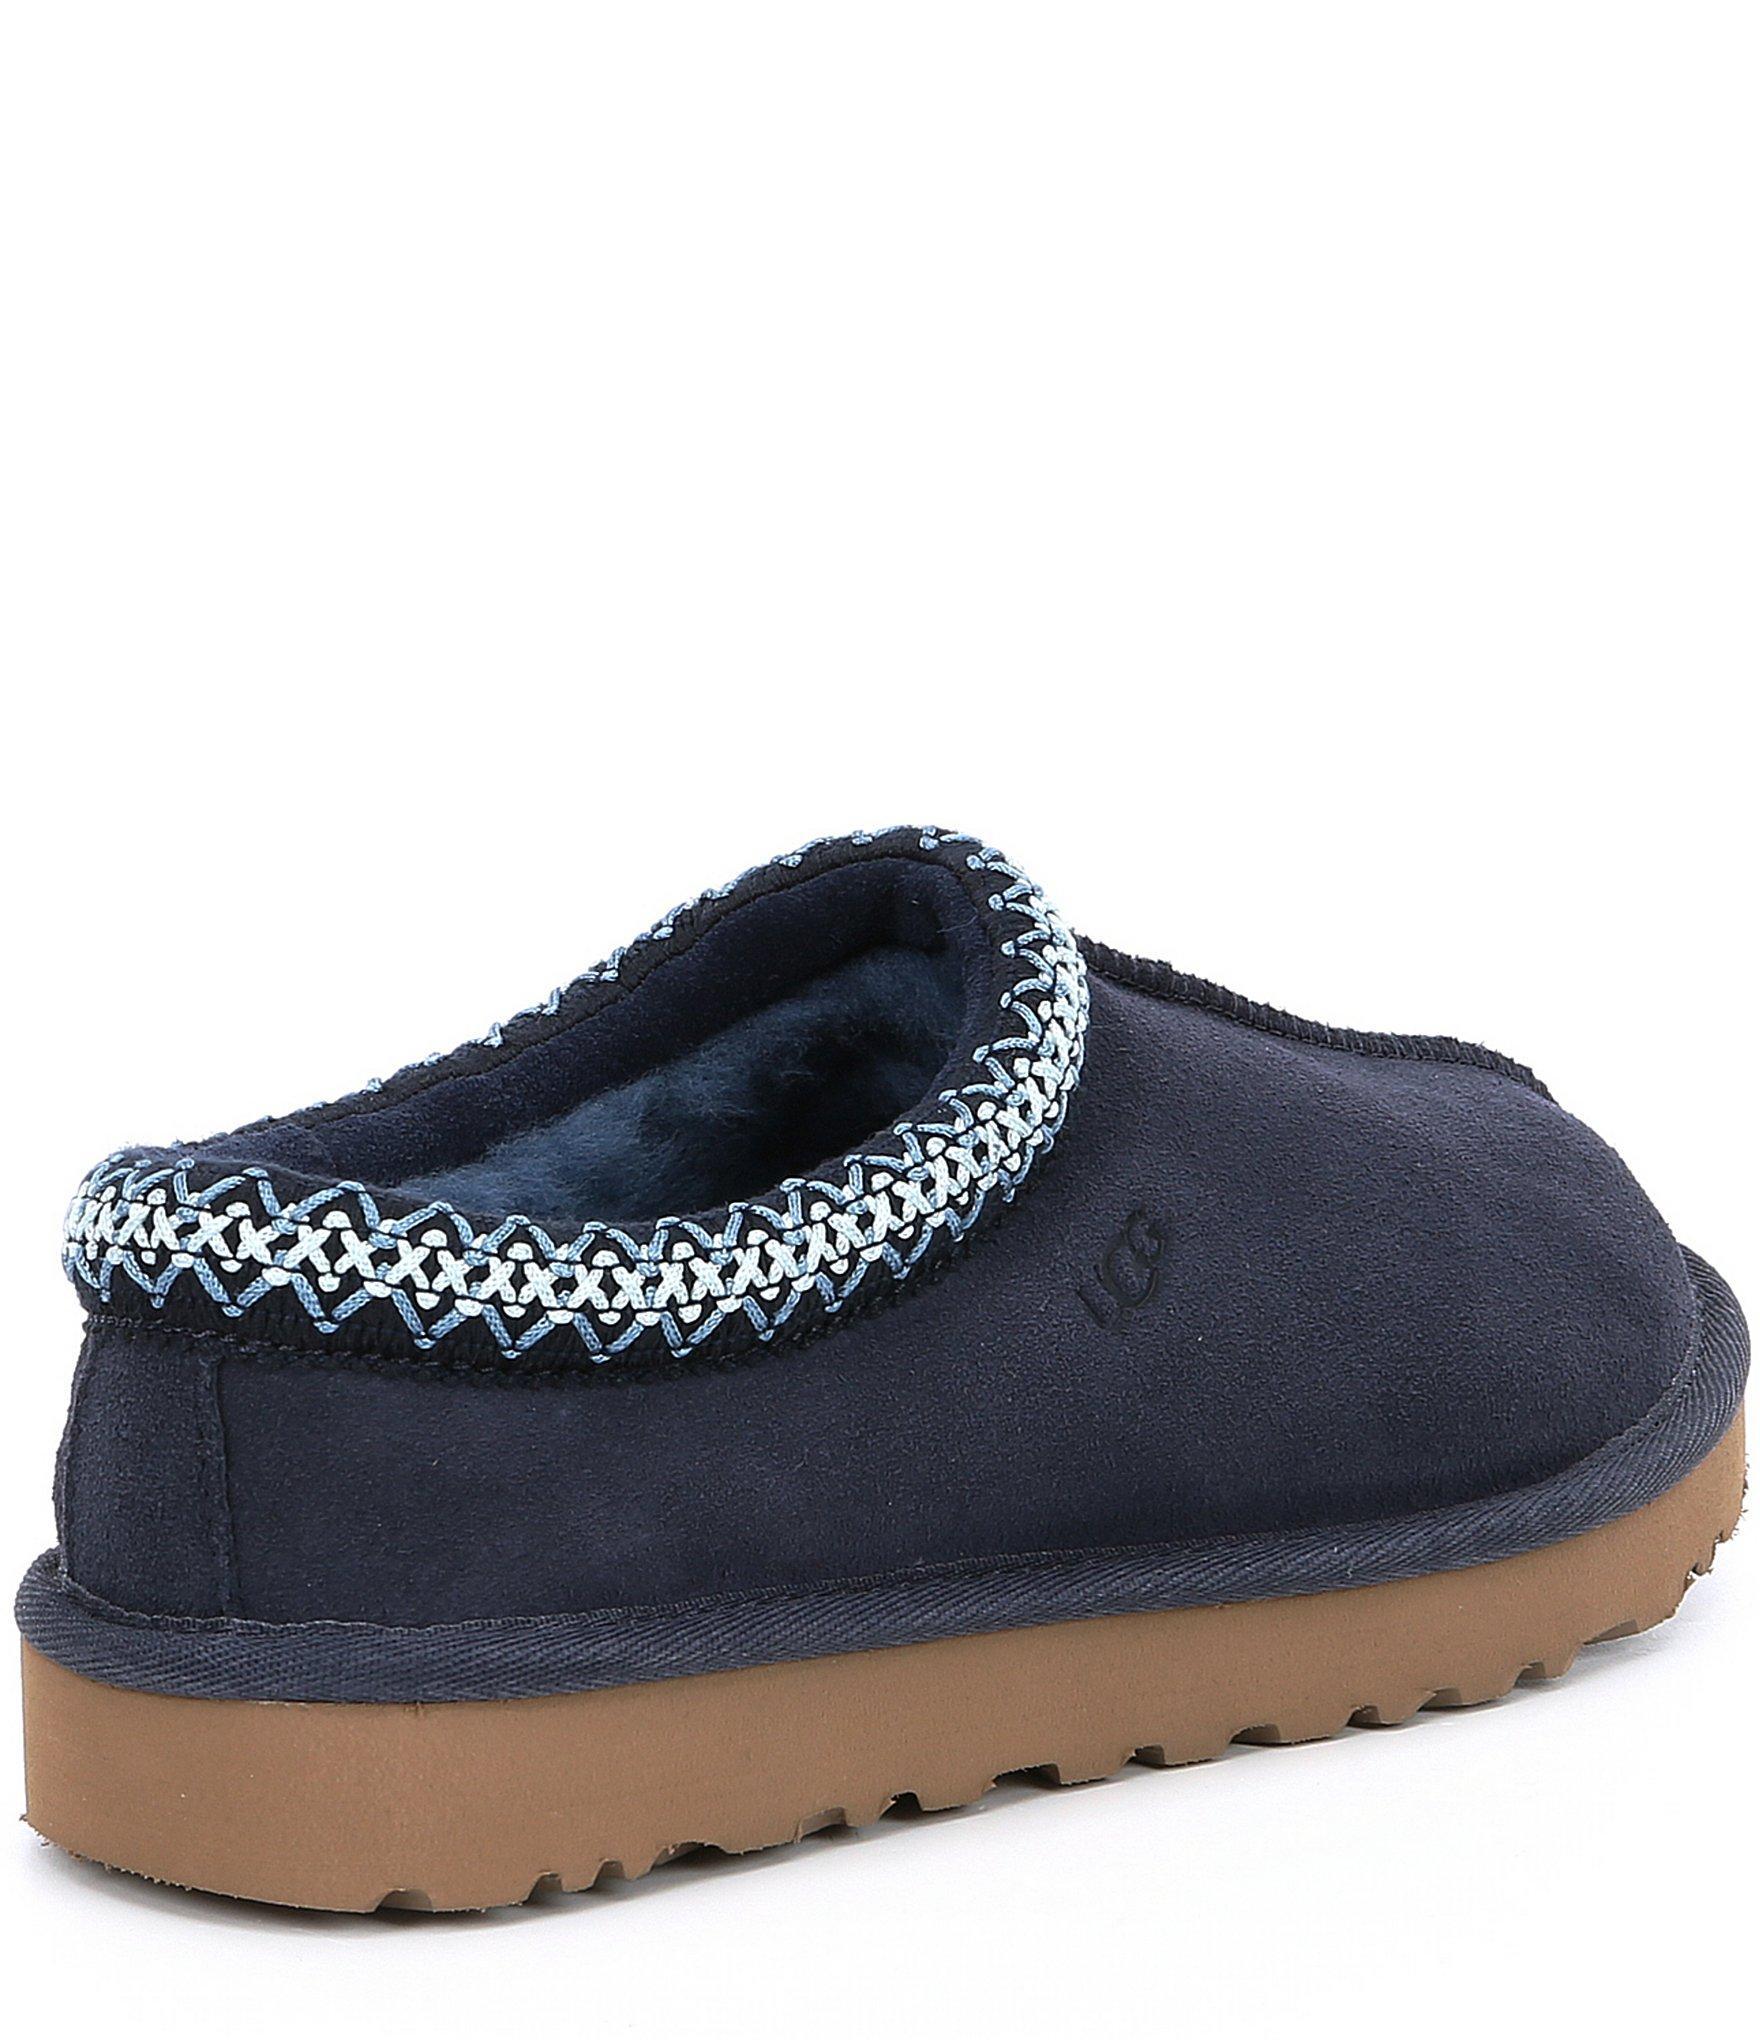 bf9269bb8c0 Blue Women's Tasman Slippers